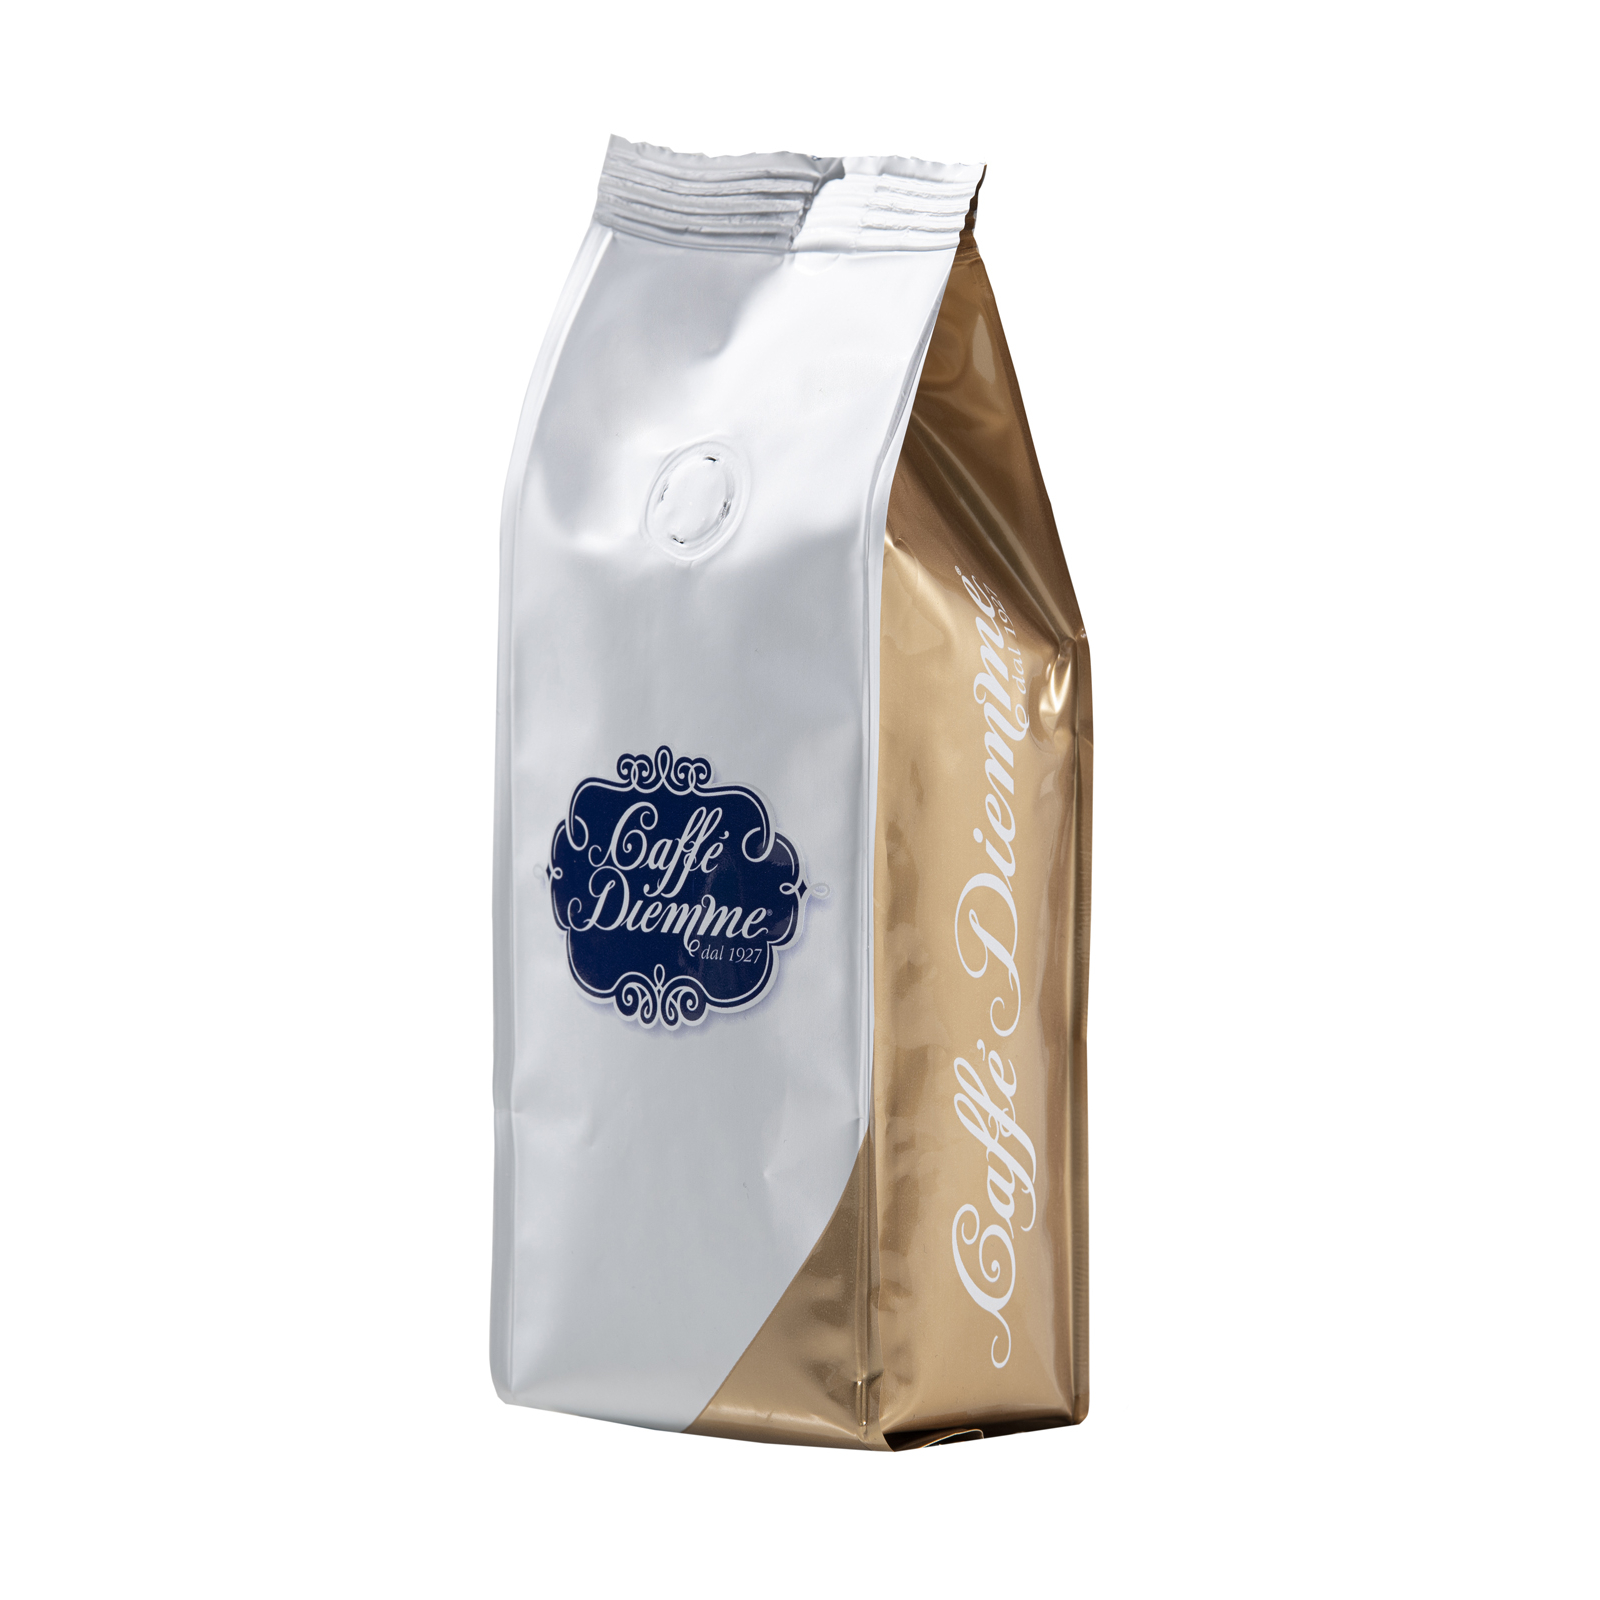 Кофе в зернах Caffe Diemme Miscela Oro 200 г кофе в зернах caffe diemme miscela oro арабика 500 г